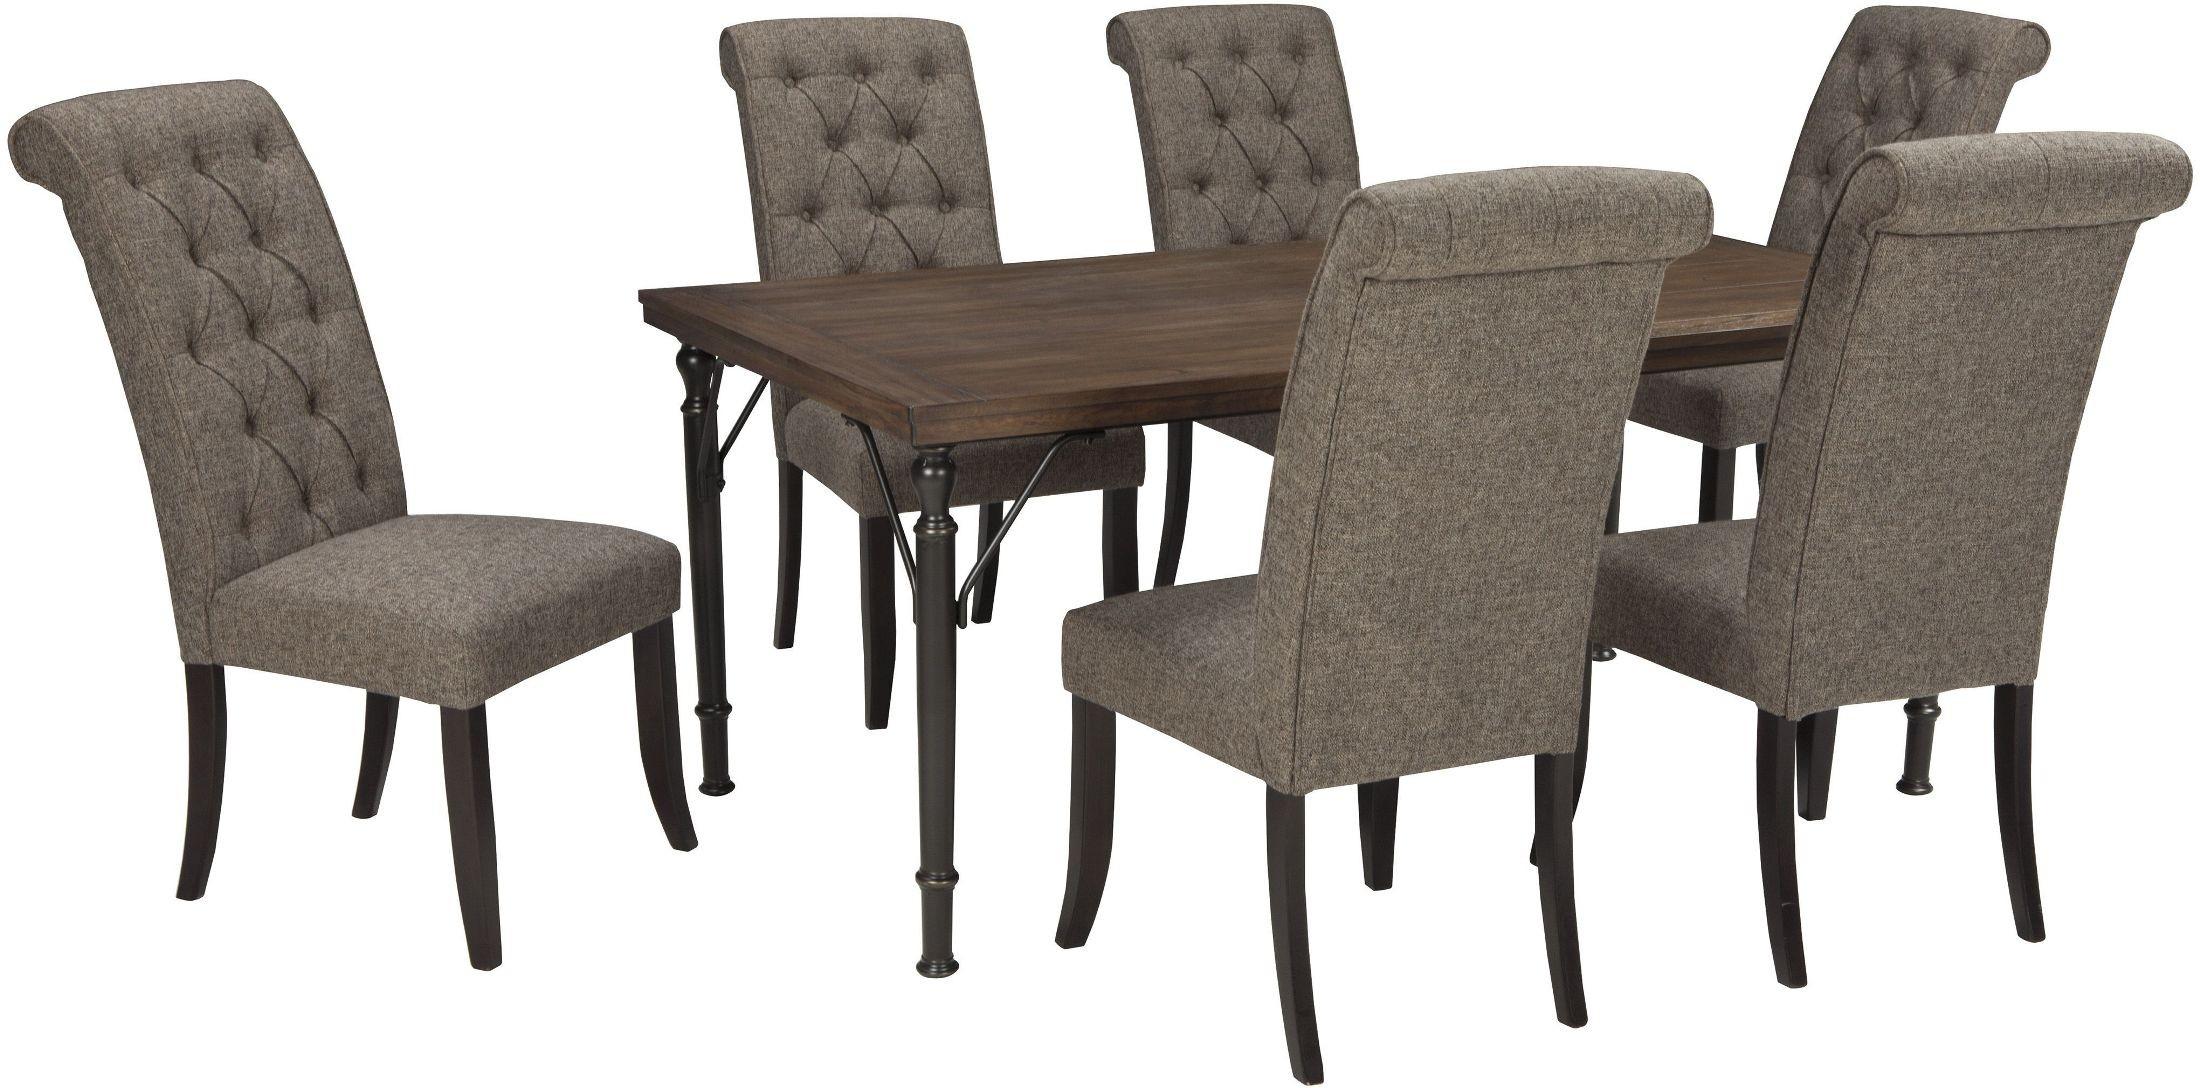 Tripton Rectangular Dining Room Set from Ashley (D530-25